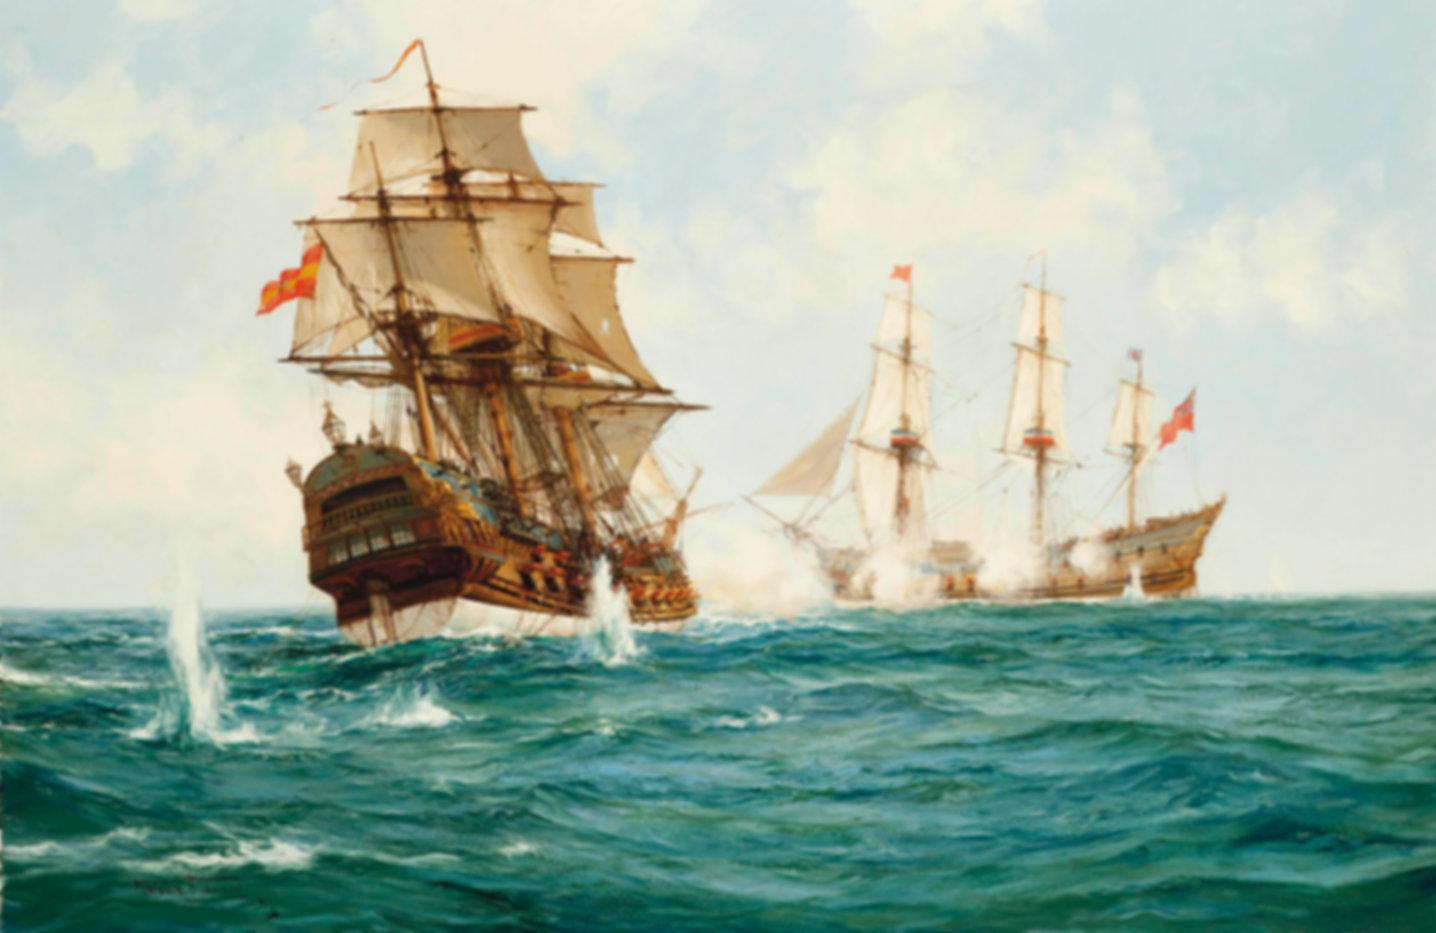 centurion_capturing_the_spanish_treasure